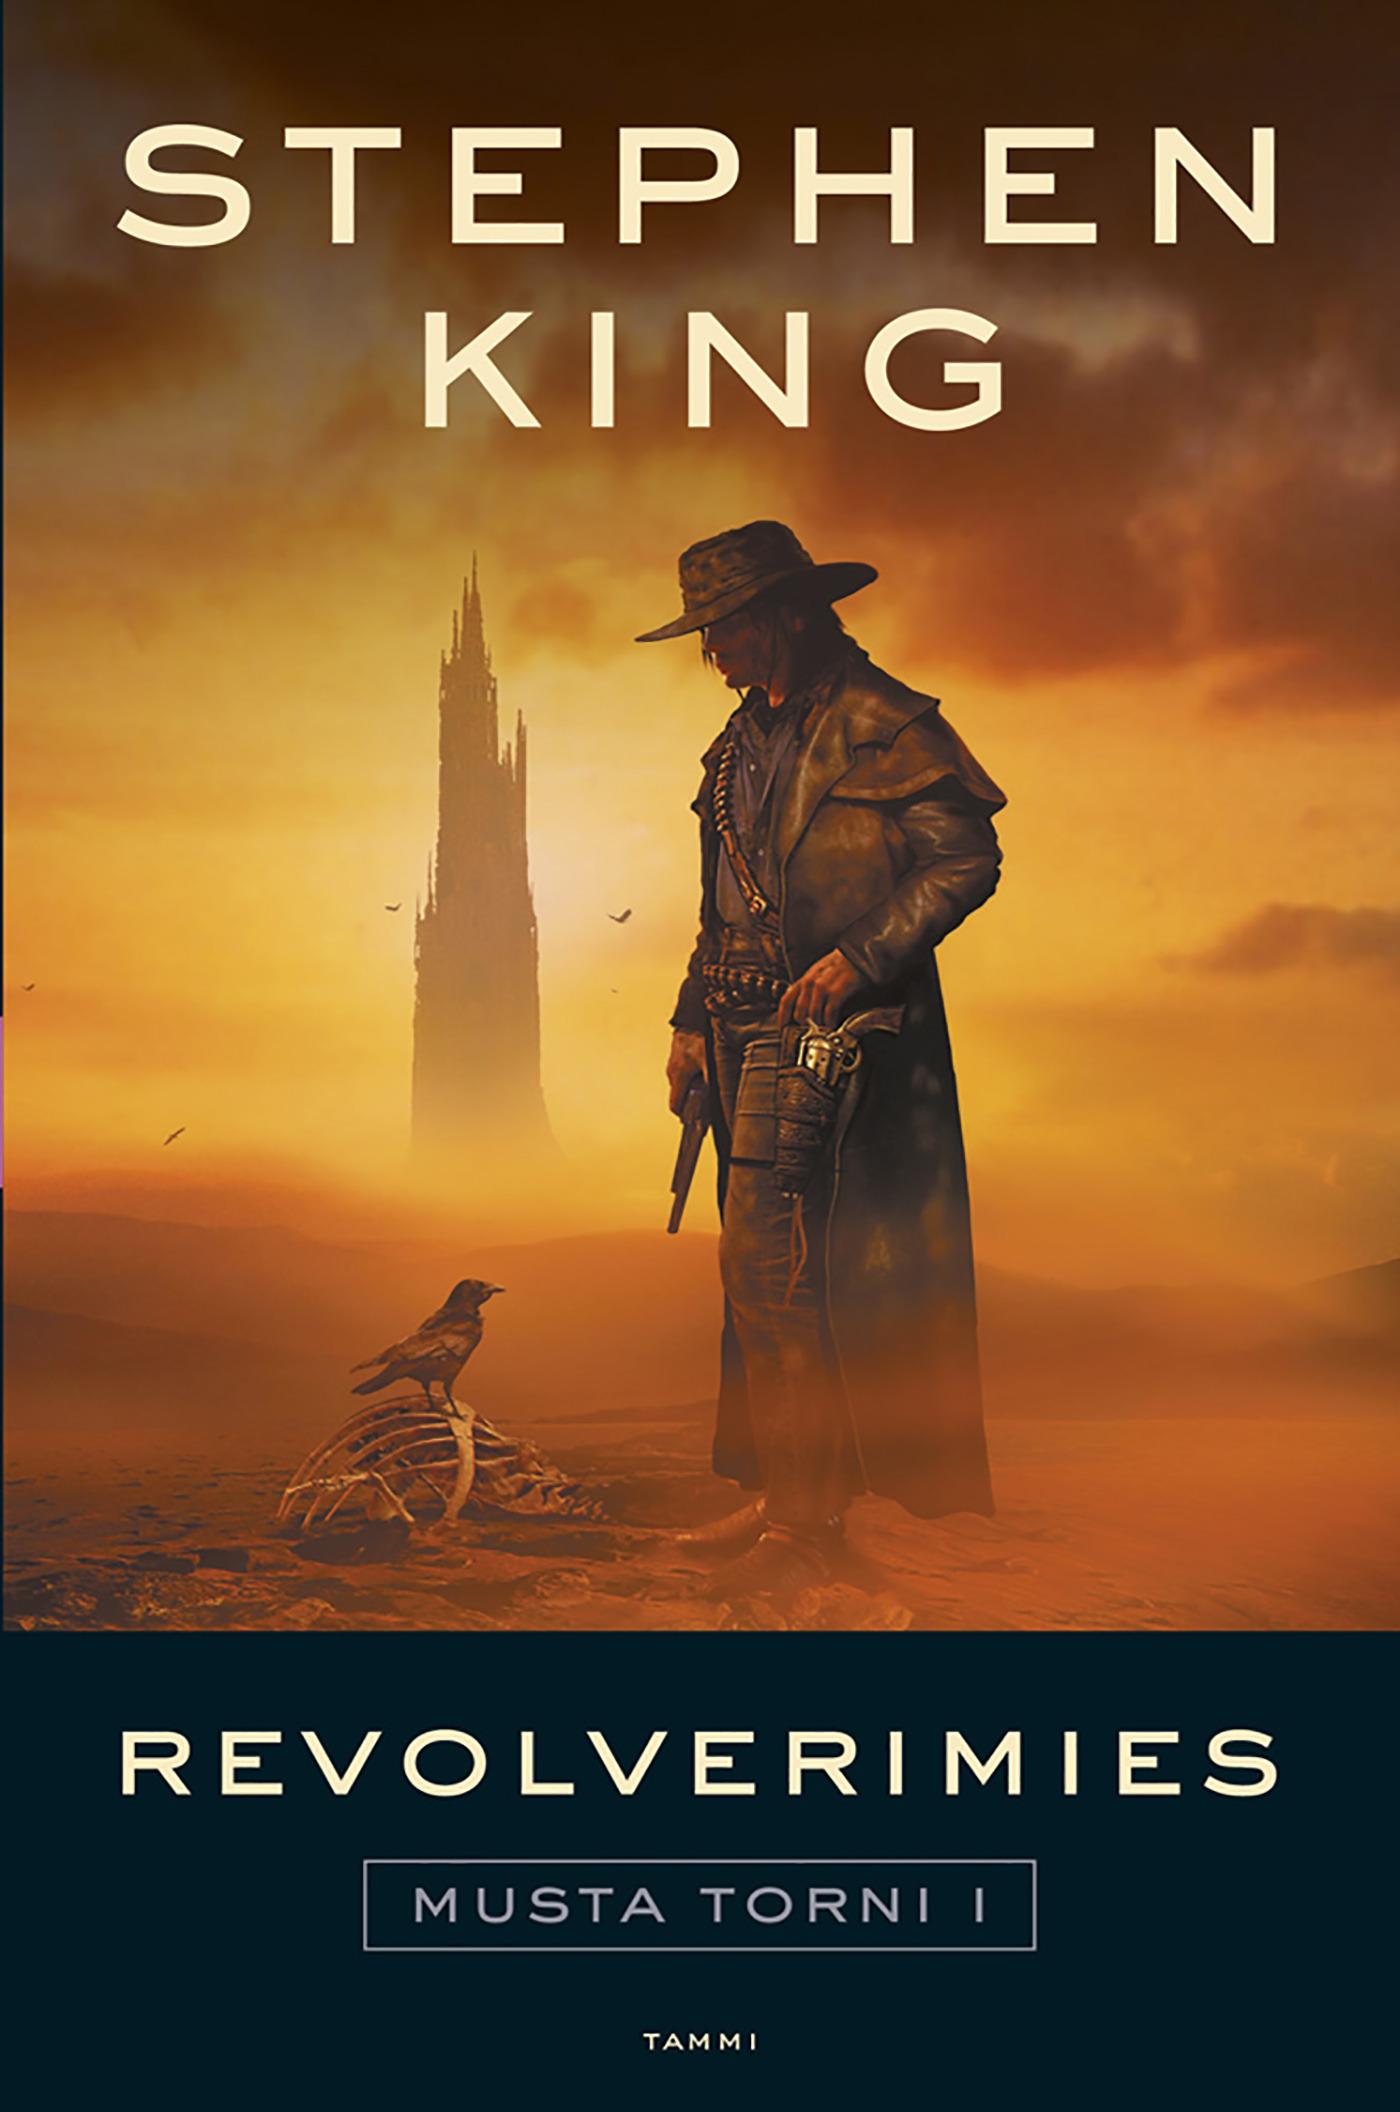 King, Stephen - Revolverimies. Musta torni 1, e-kirja